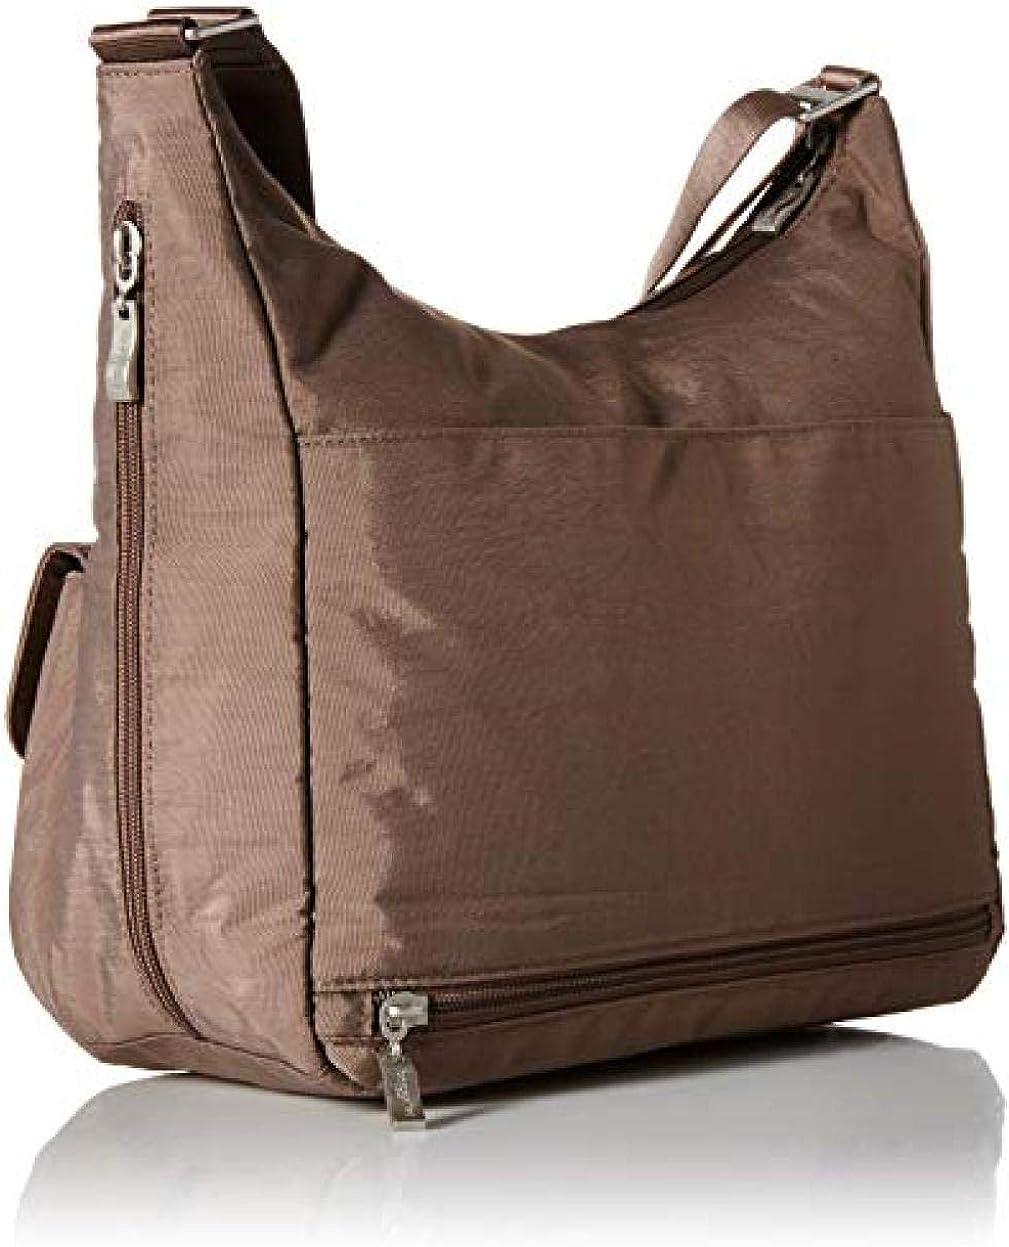 YAOUOBAG Women Pu Leather Vintage Hollow Bag Crossbody Bag Shoulder Bag Women Backpack@Rosa Chiaro_Dimensioni Del Prodotto: 5,9 X 0,8 X 8,7 Pollici Portobello